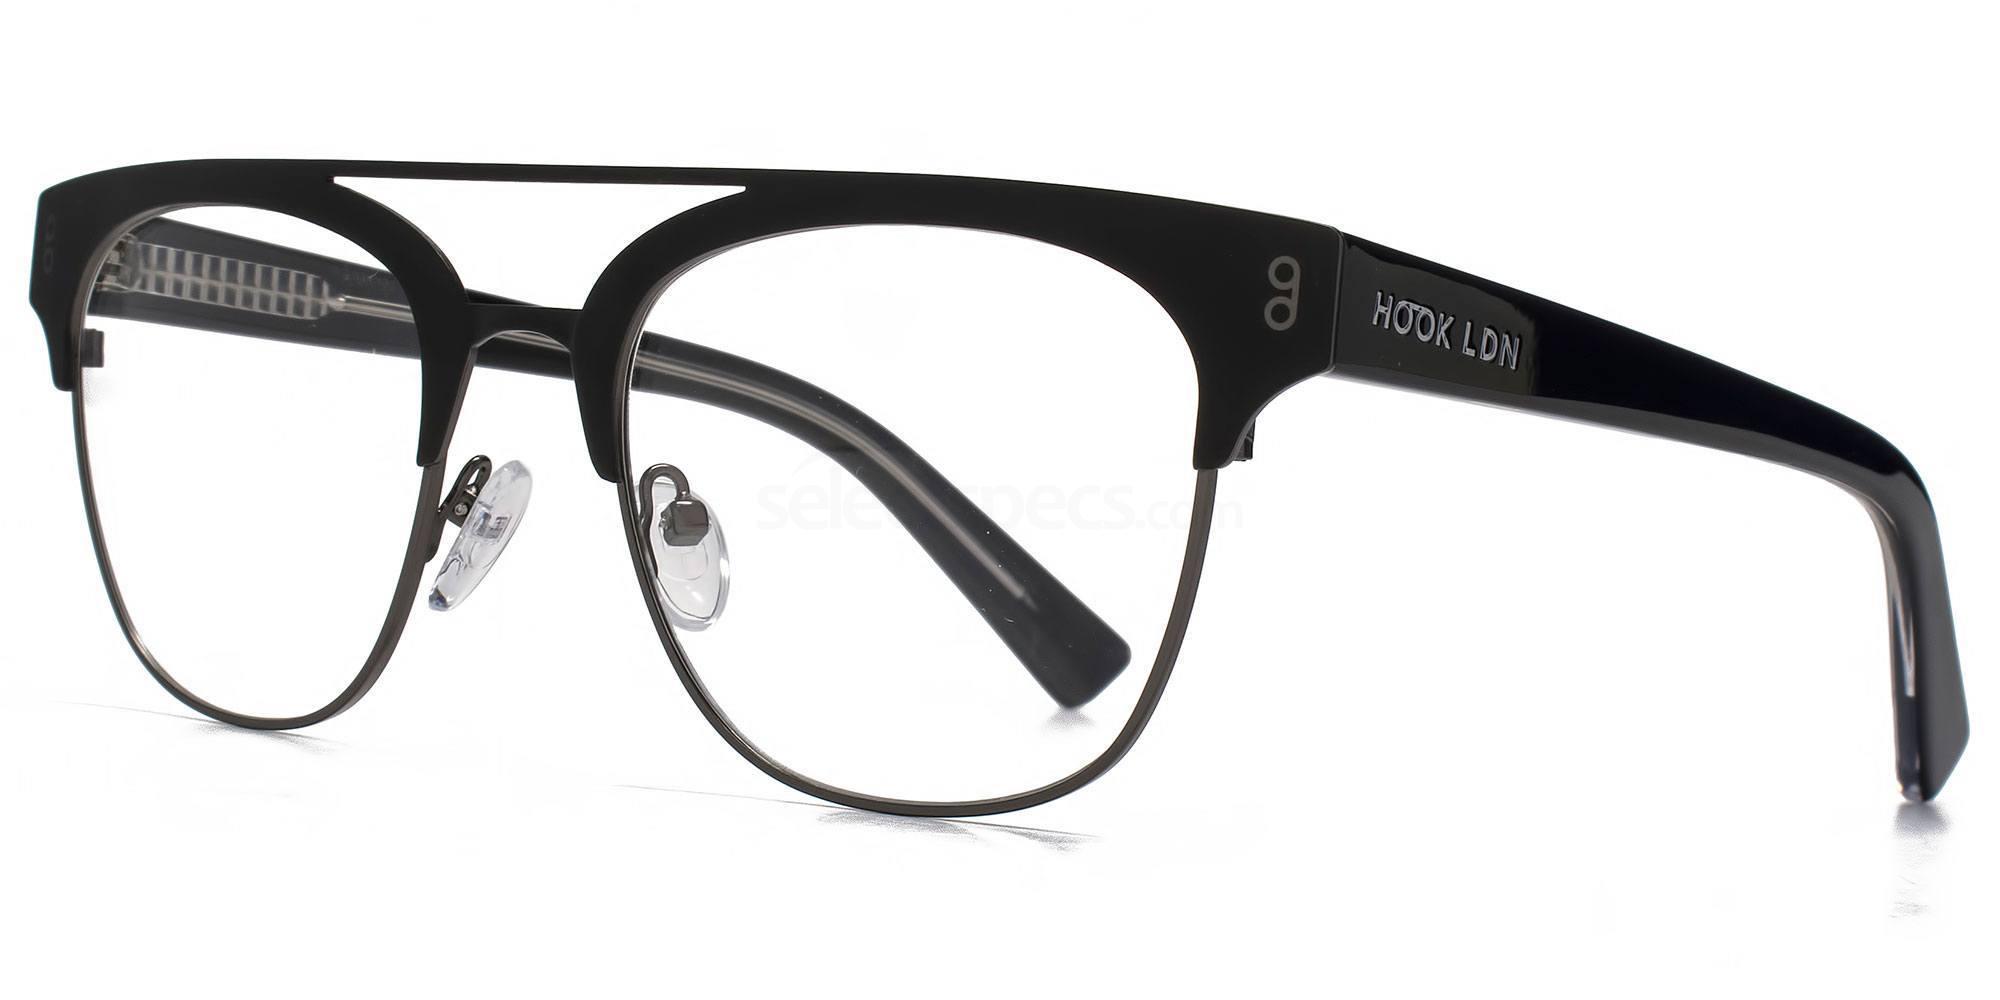 BLK HKS005 - FARAWAY Glasses, Hook LDN